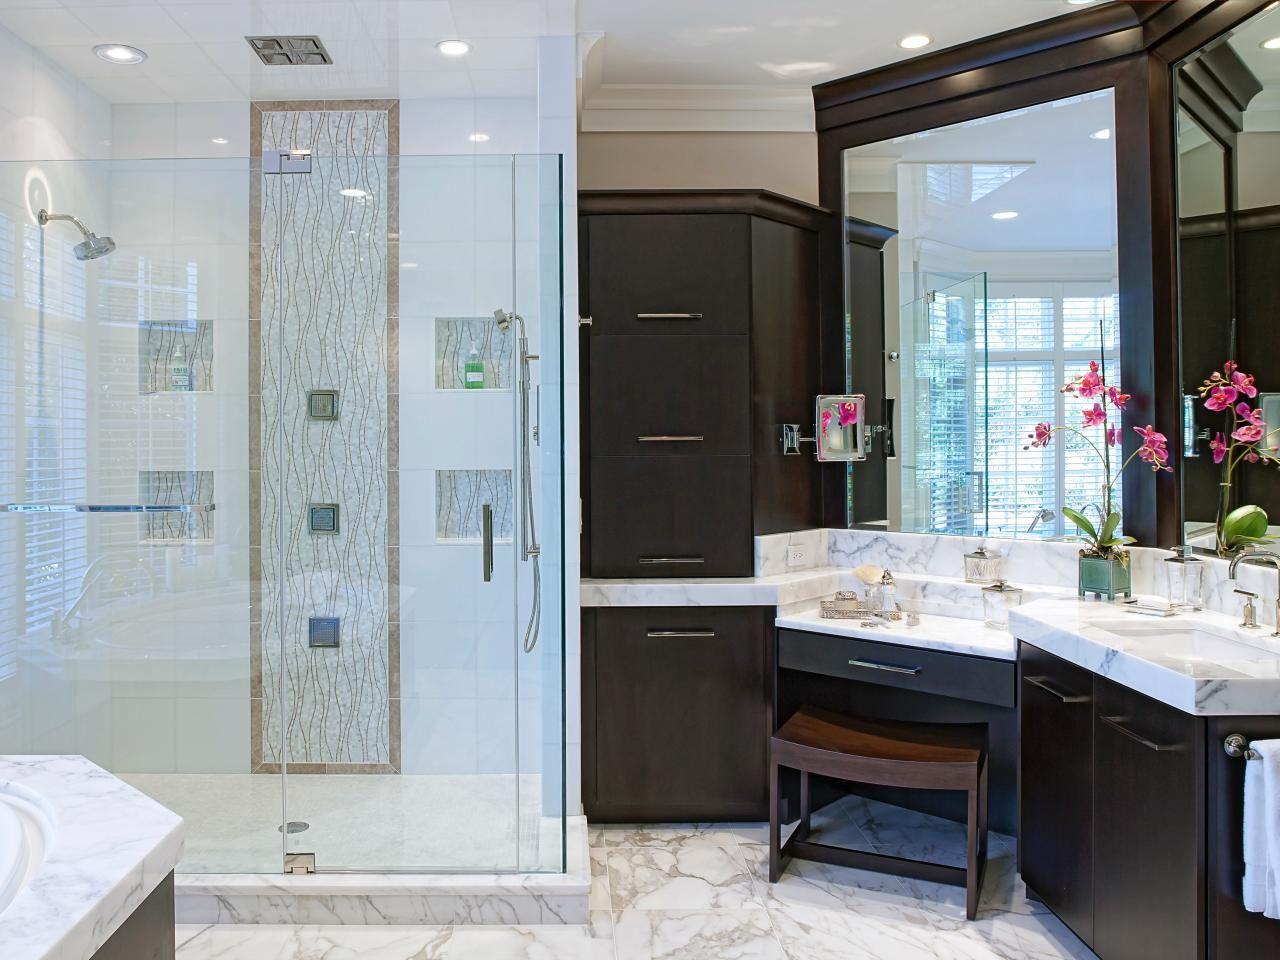 Makeup Vanity In Bathroom Google Search Bath